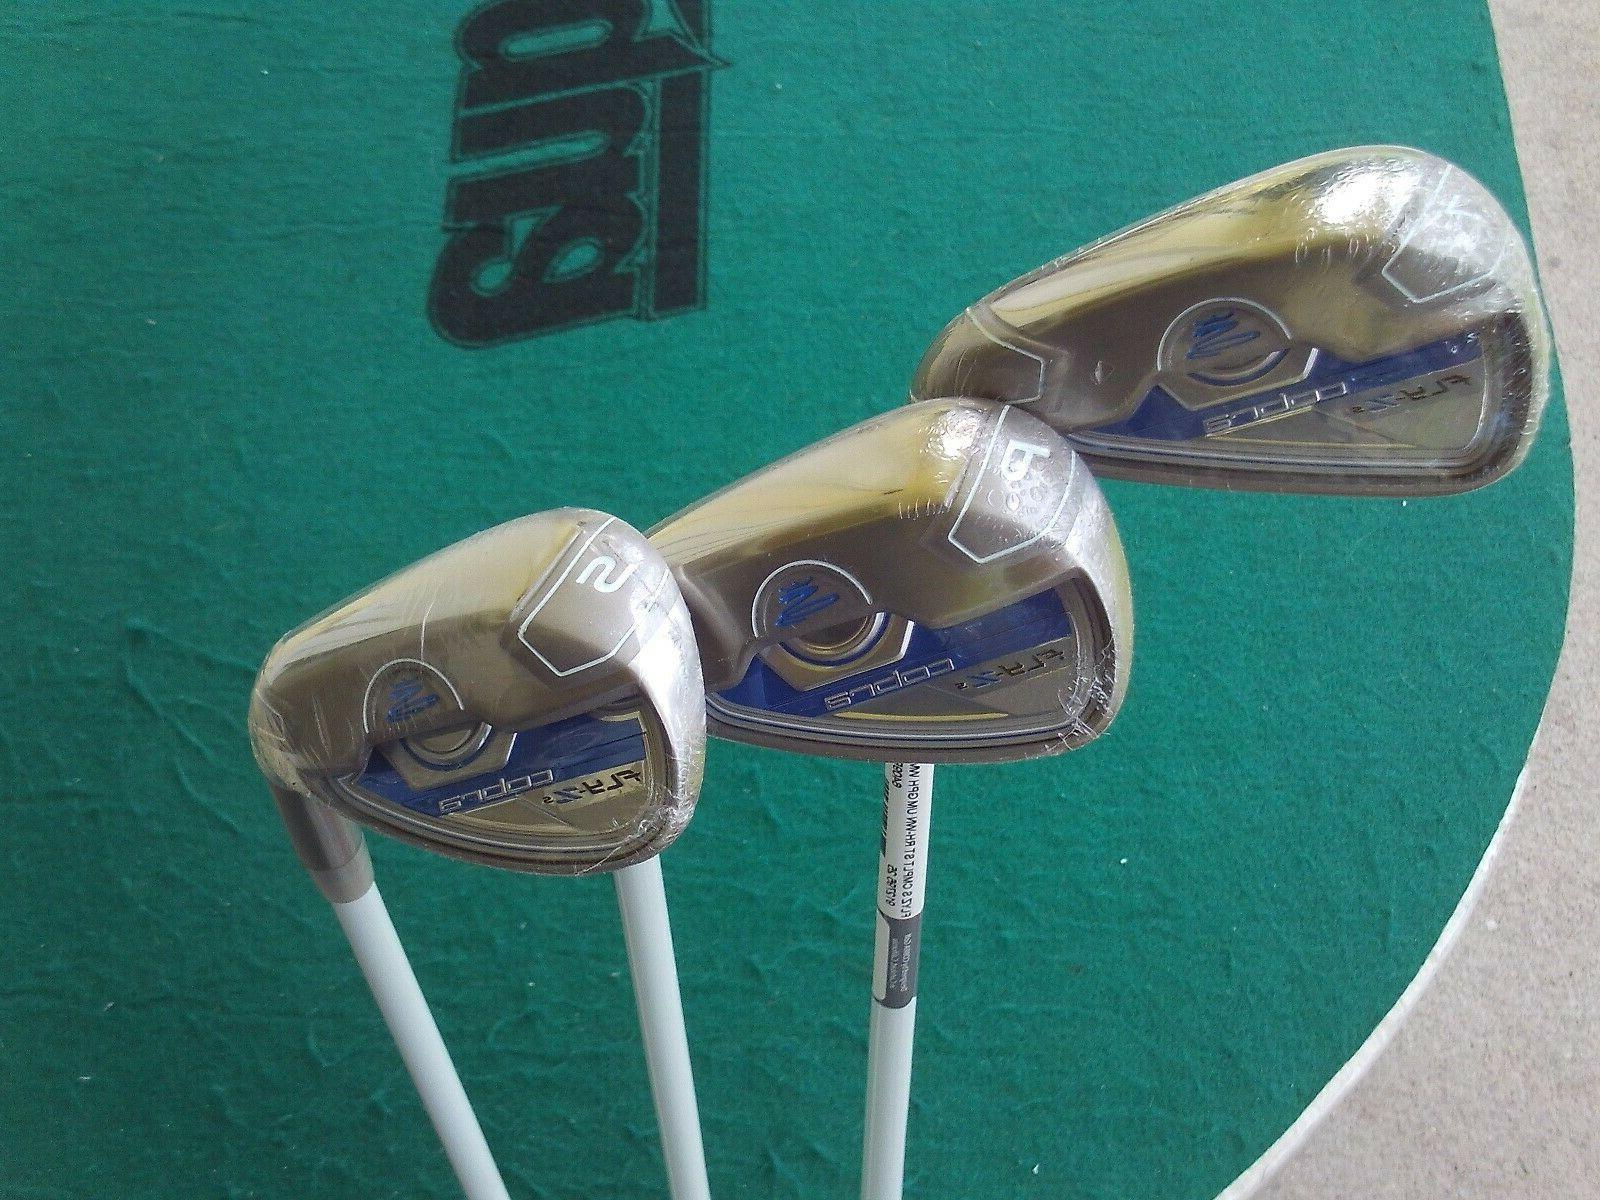 Brand Lady Wedge Set Graphite Golf Club Grips